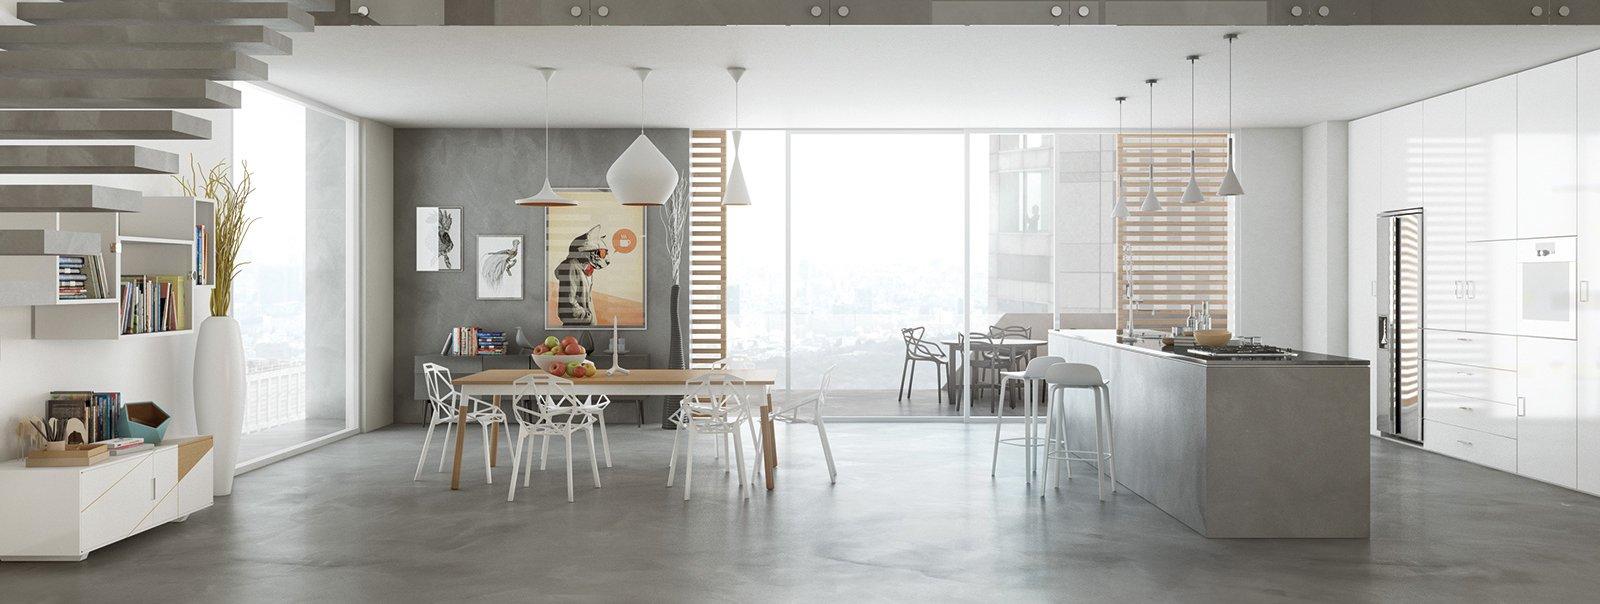 Lavelli In Pietra Per Cucina : Resina rivestimenti per pavimenti pareti piani di